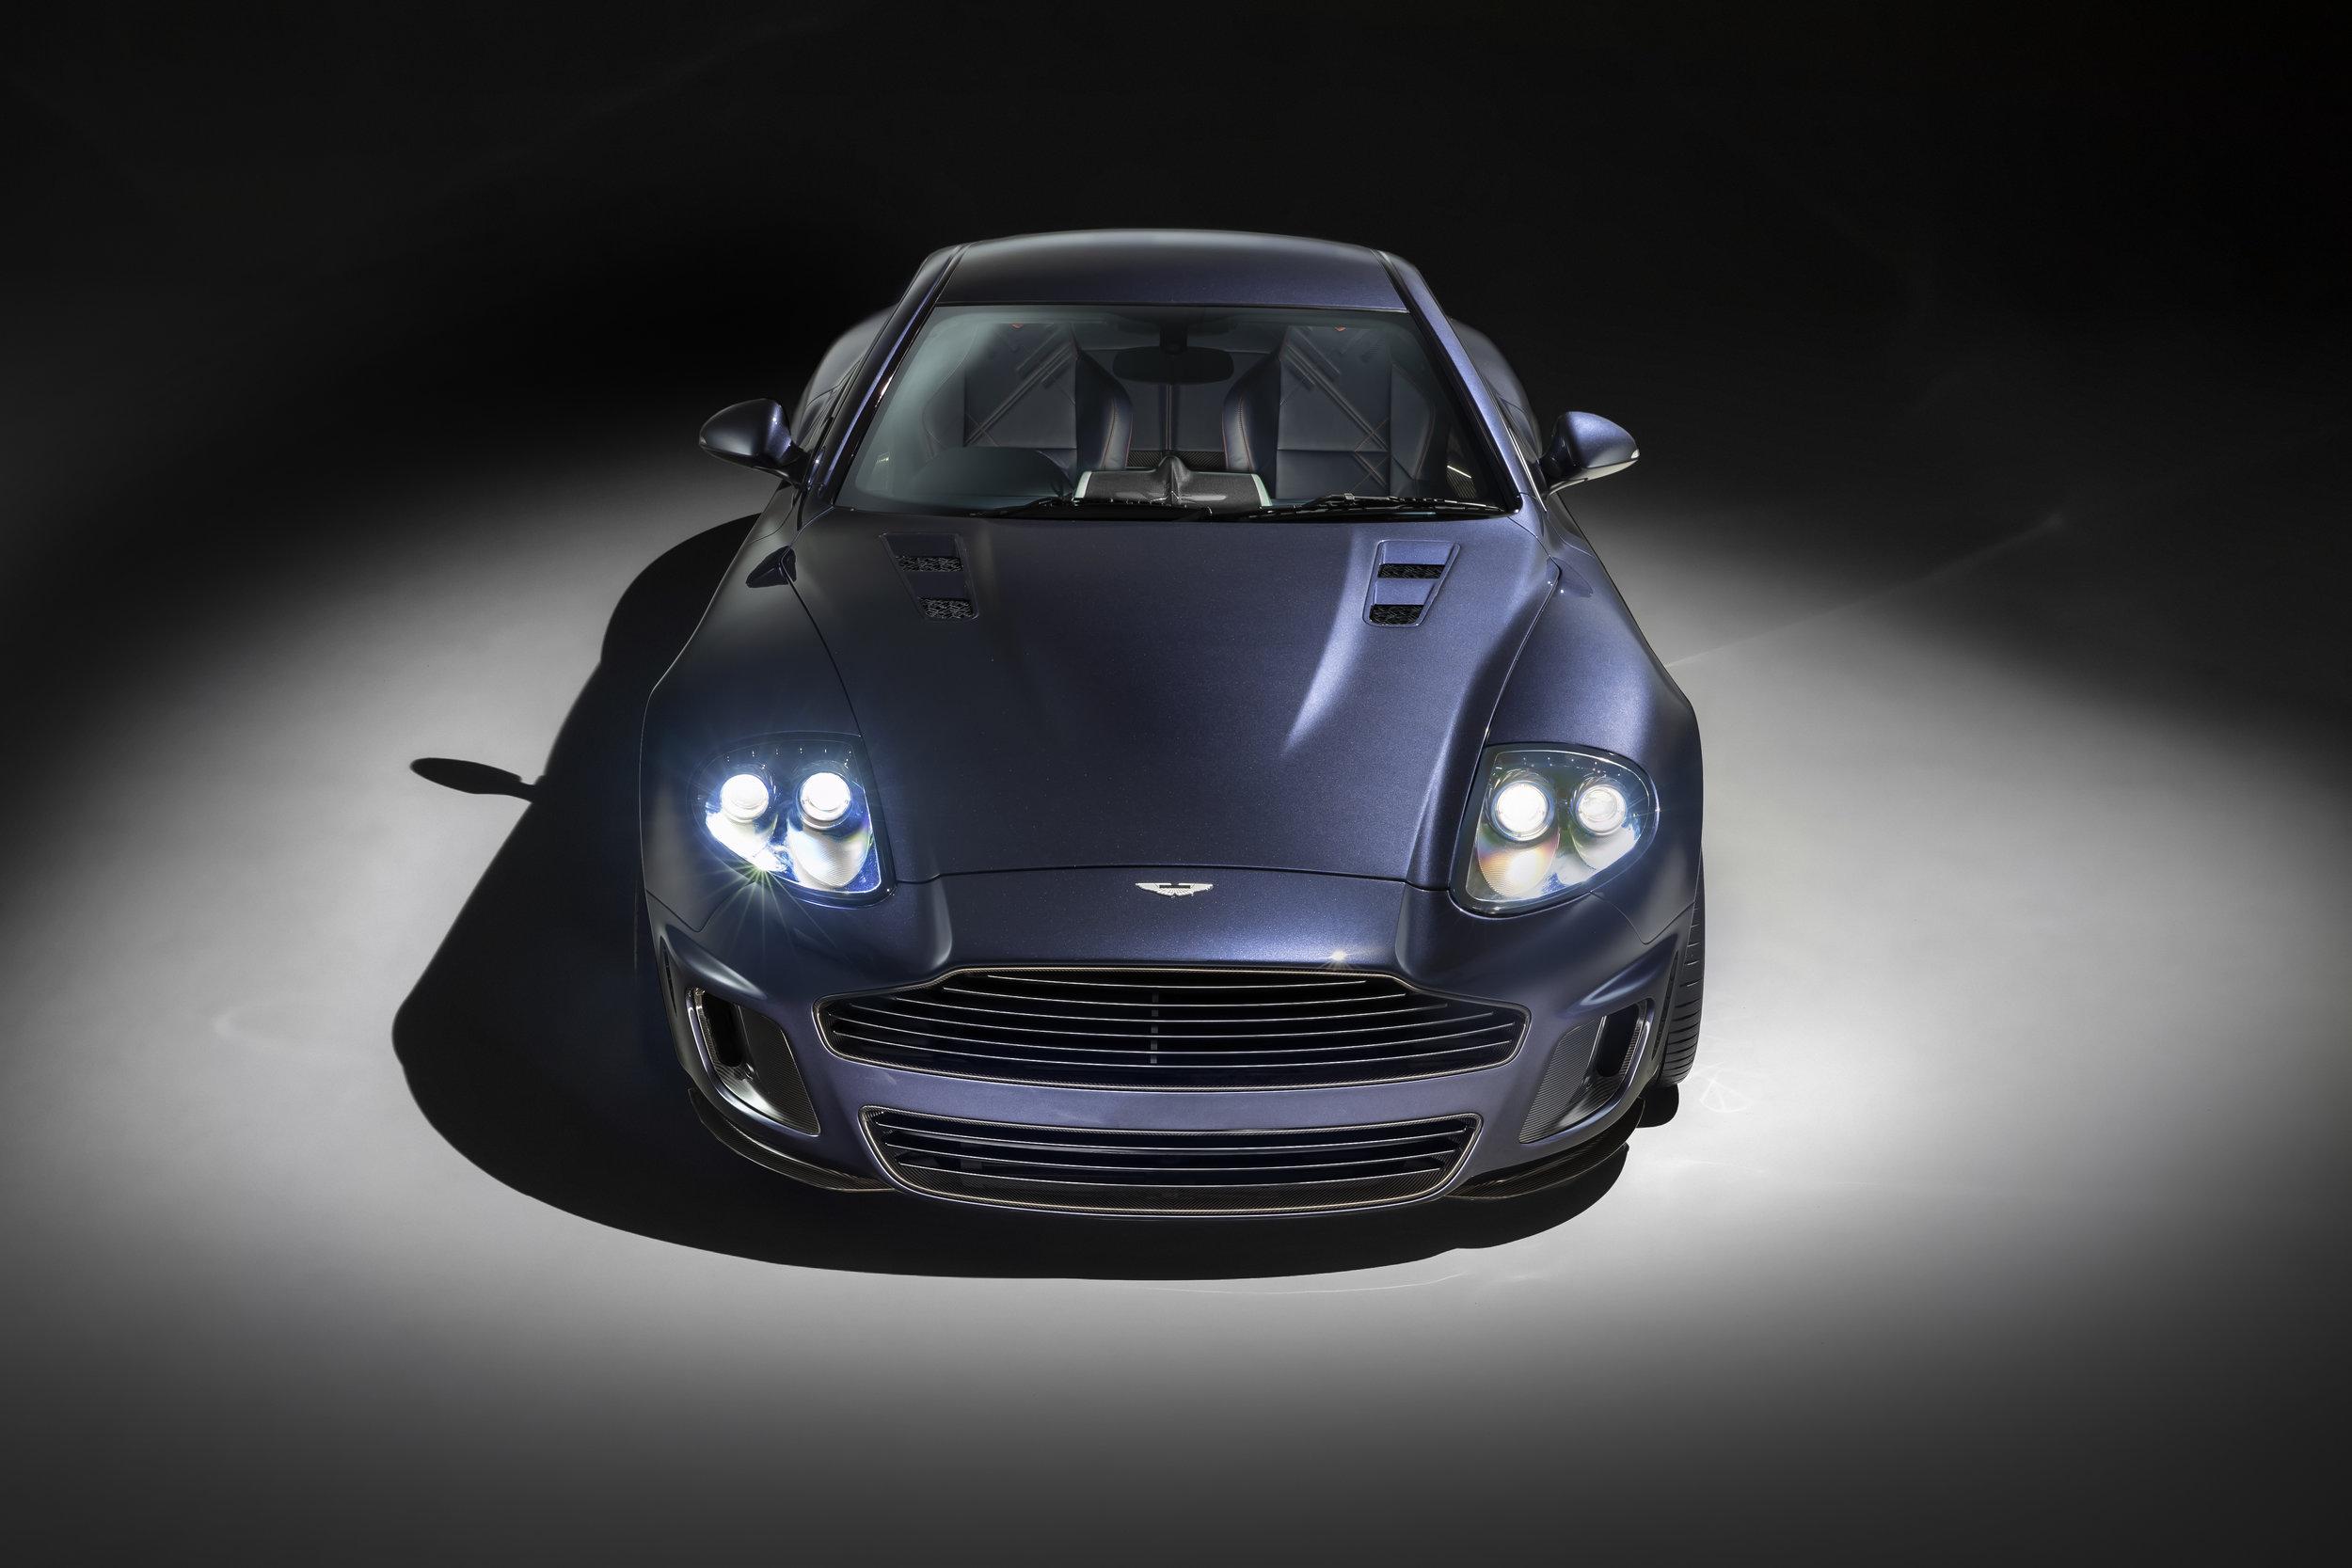 Aston Martin Vanquish 25 by CALLUM (2).jpg